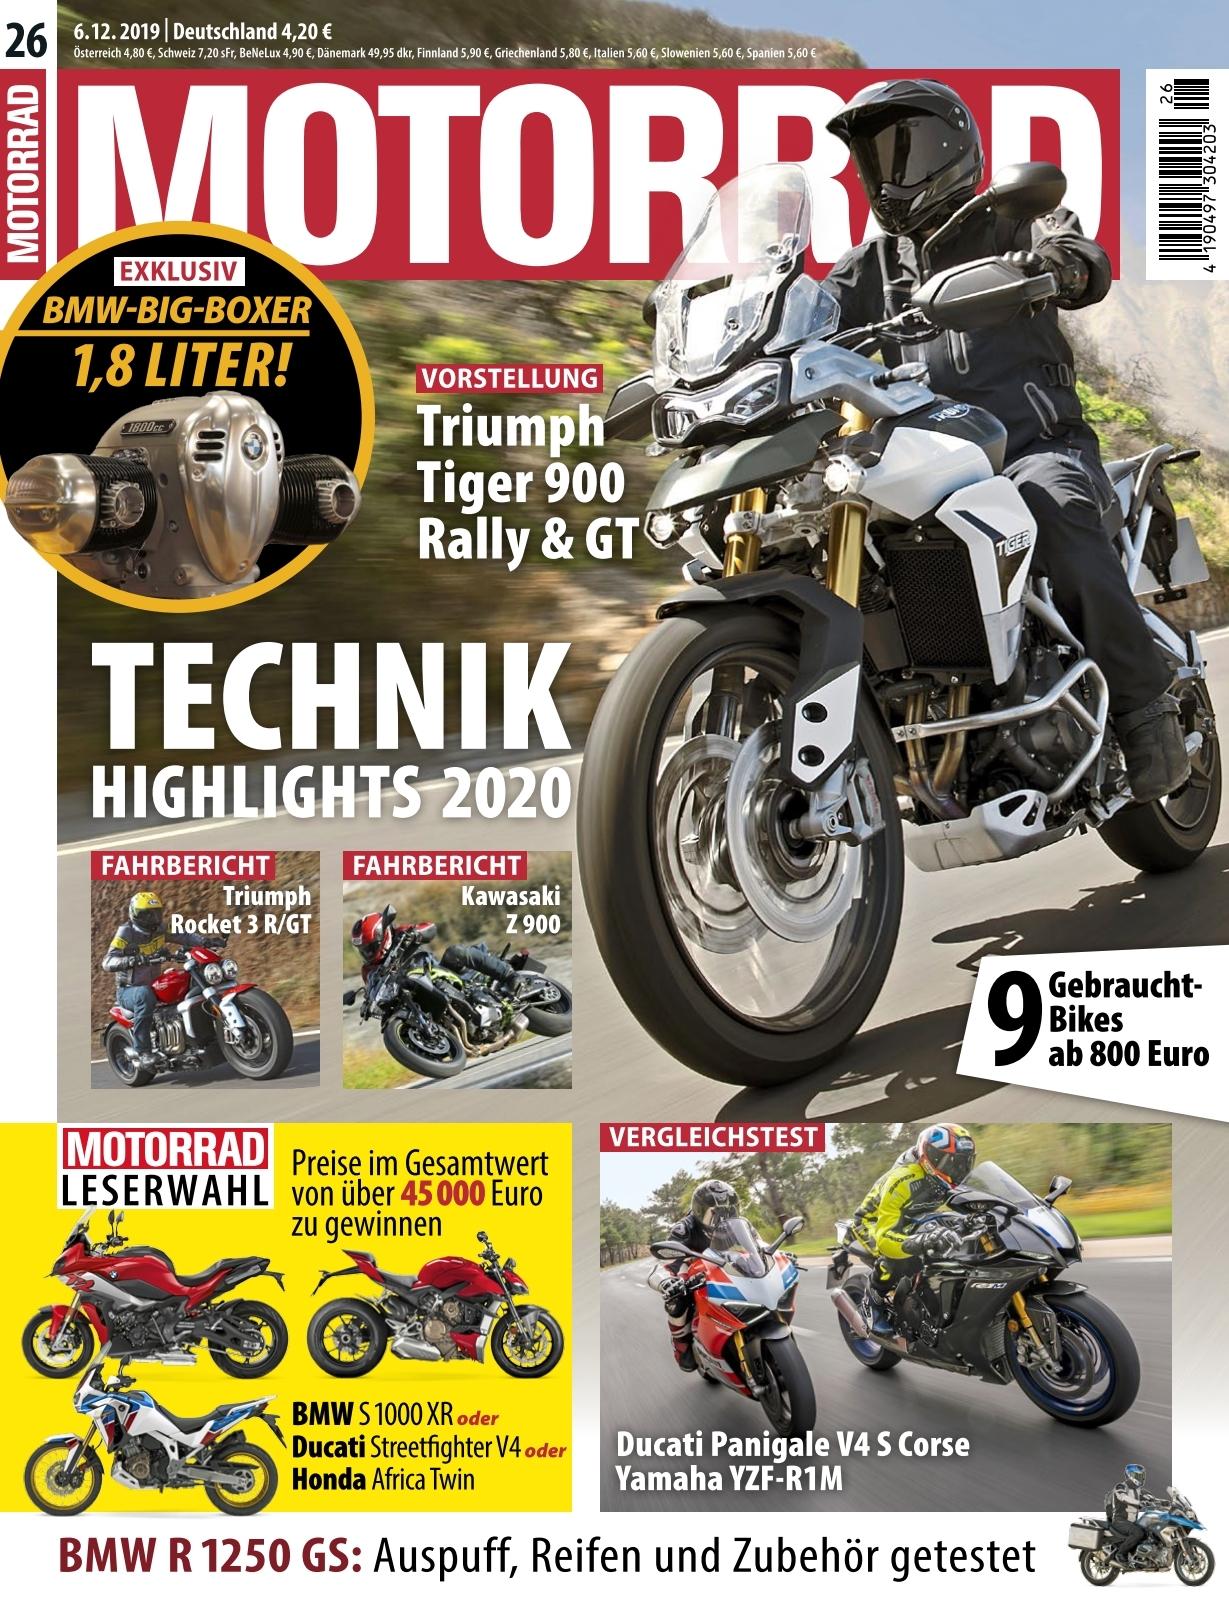 Honda MT 80 Enduro Proma Renn Auspuff Krümmer Birne Mokick Moped Rennauspuff Neu